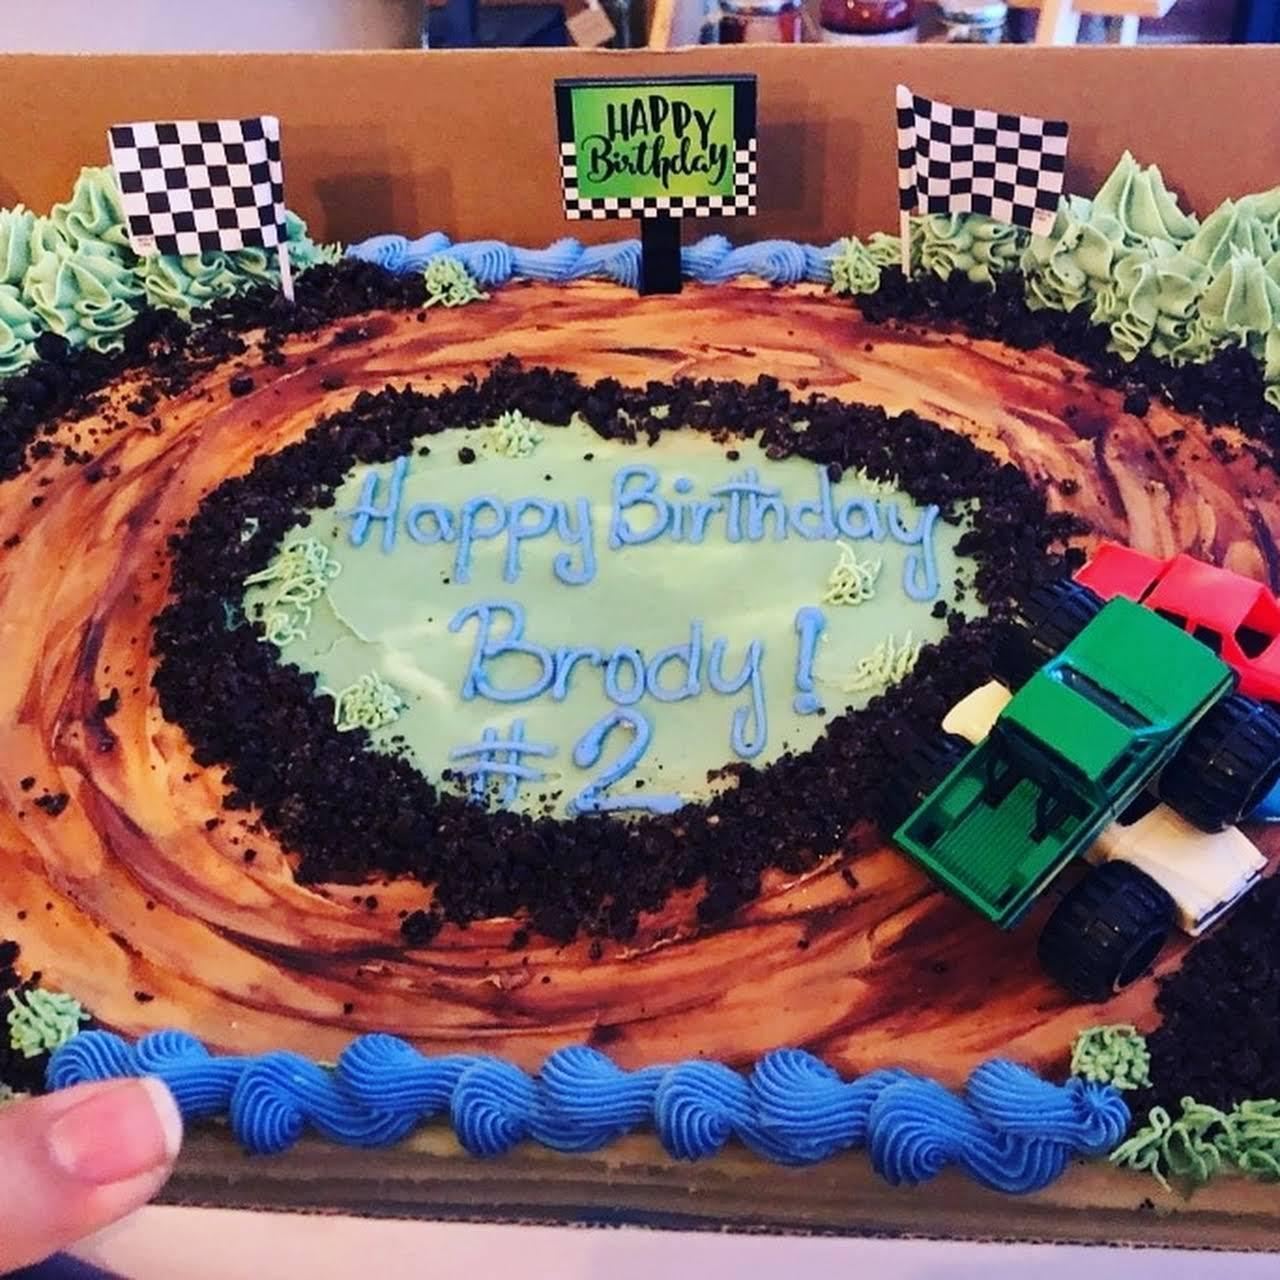 Peachy Lushlife Vegan Bakery Bakery In Madison Personalised Birthday Cards Cominlily Jamesorg